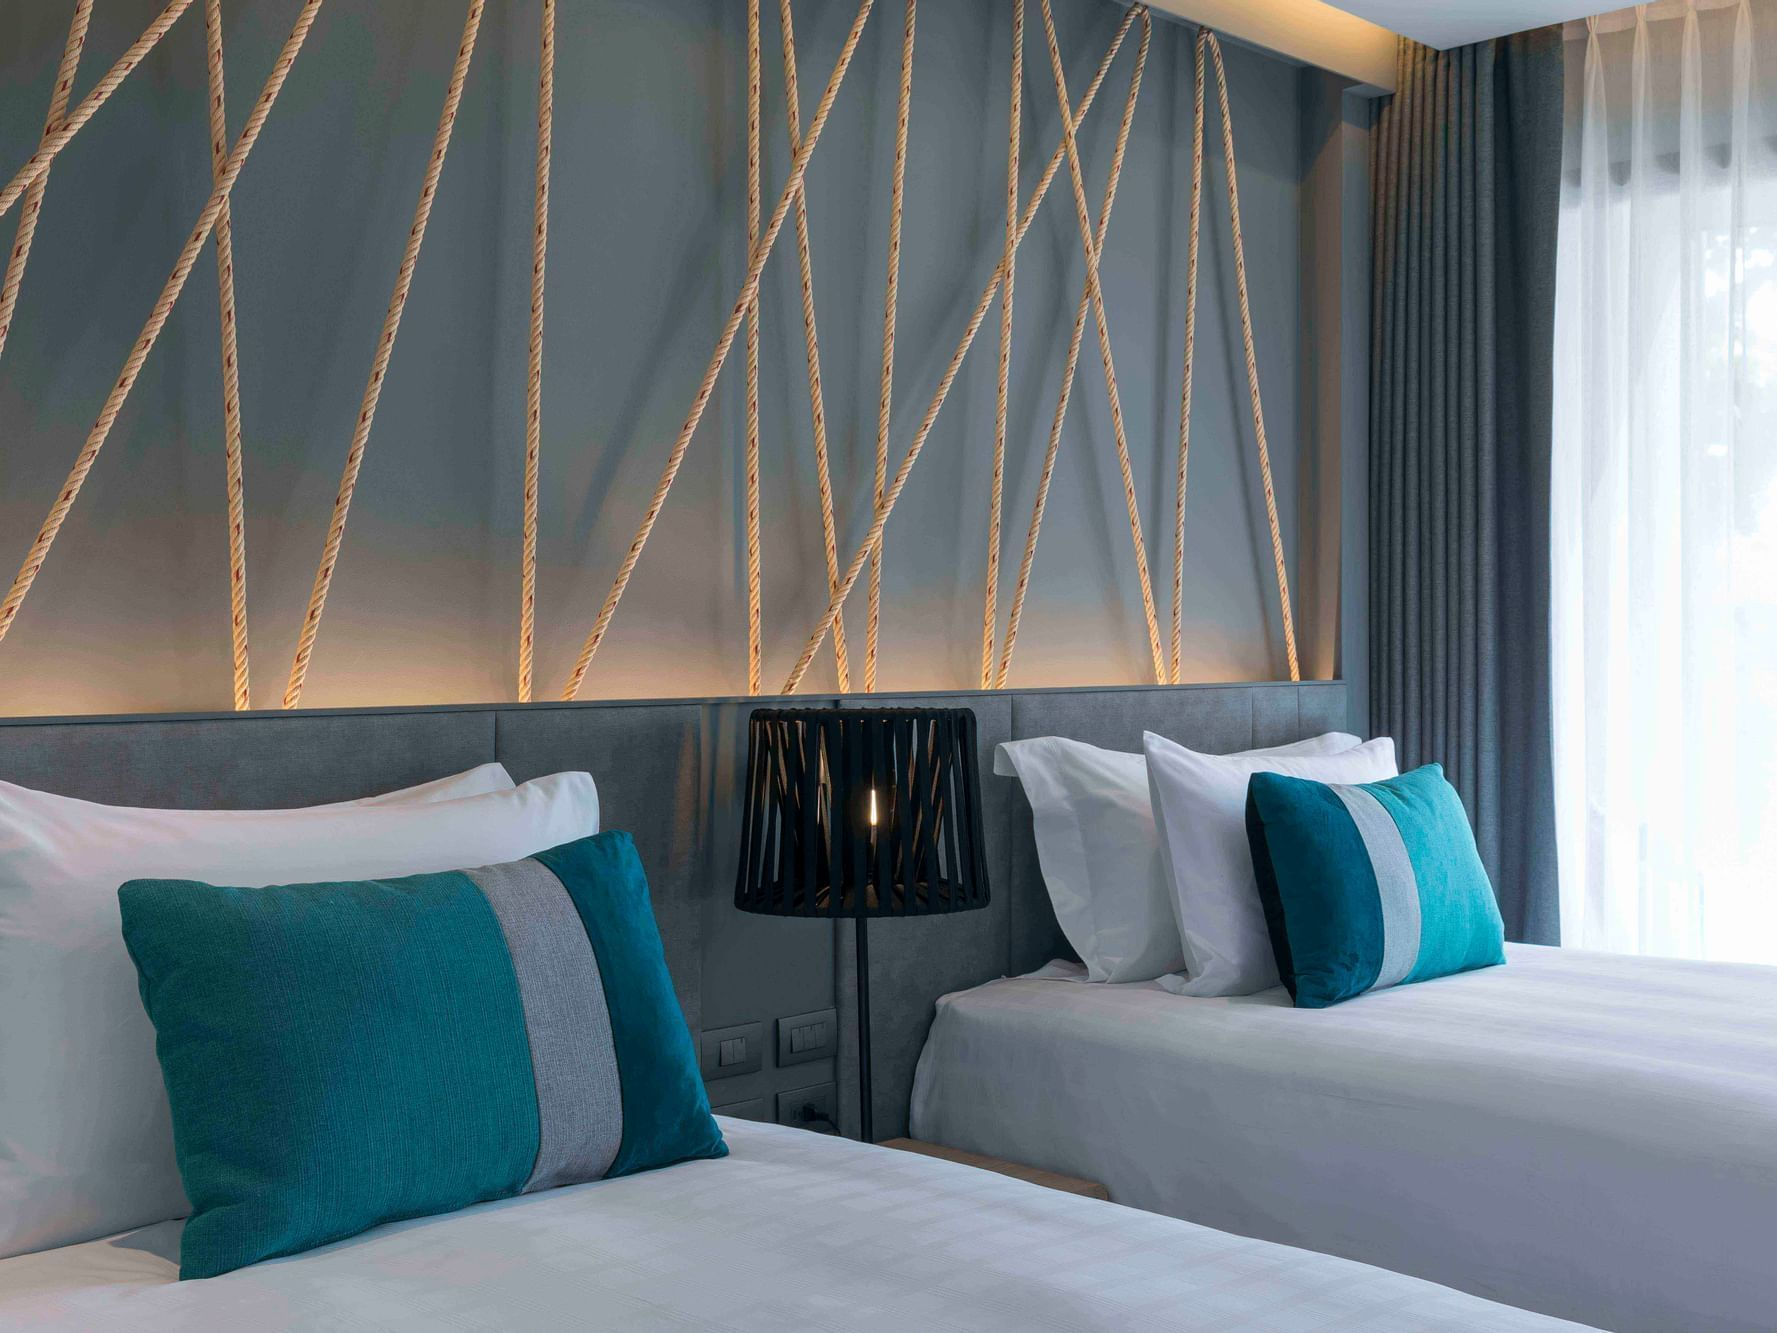 Superior Seaview room at U Hotels and Resorts